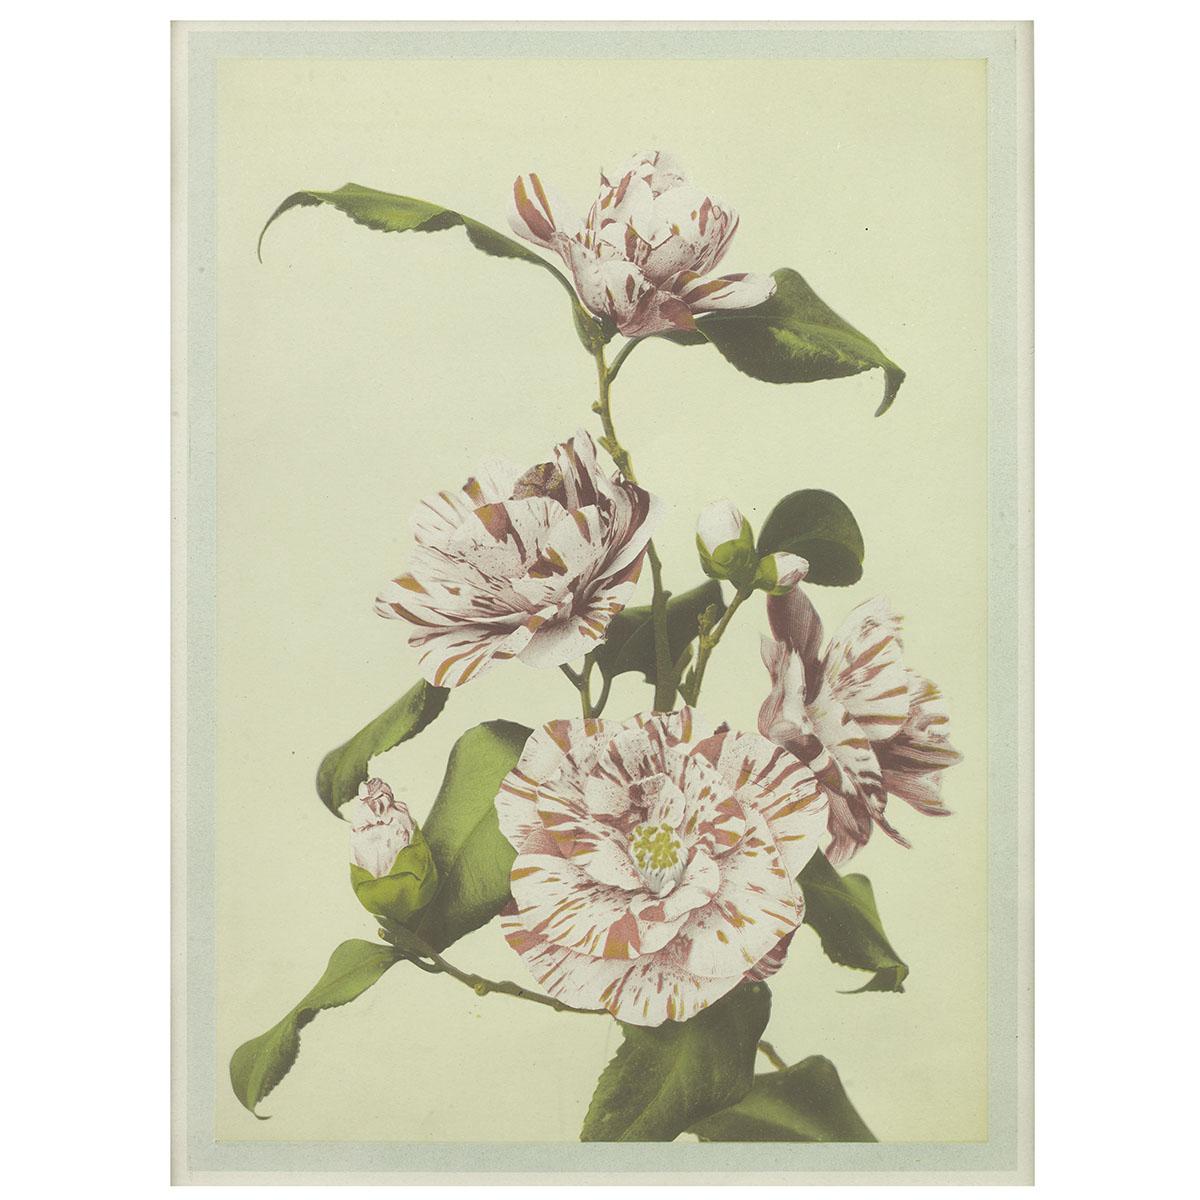 Ogawa Kazumasa, Collotype of Camellia